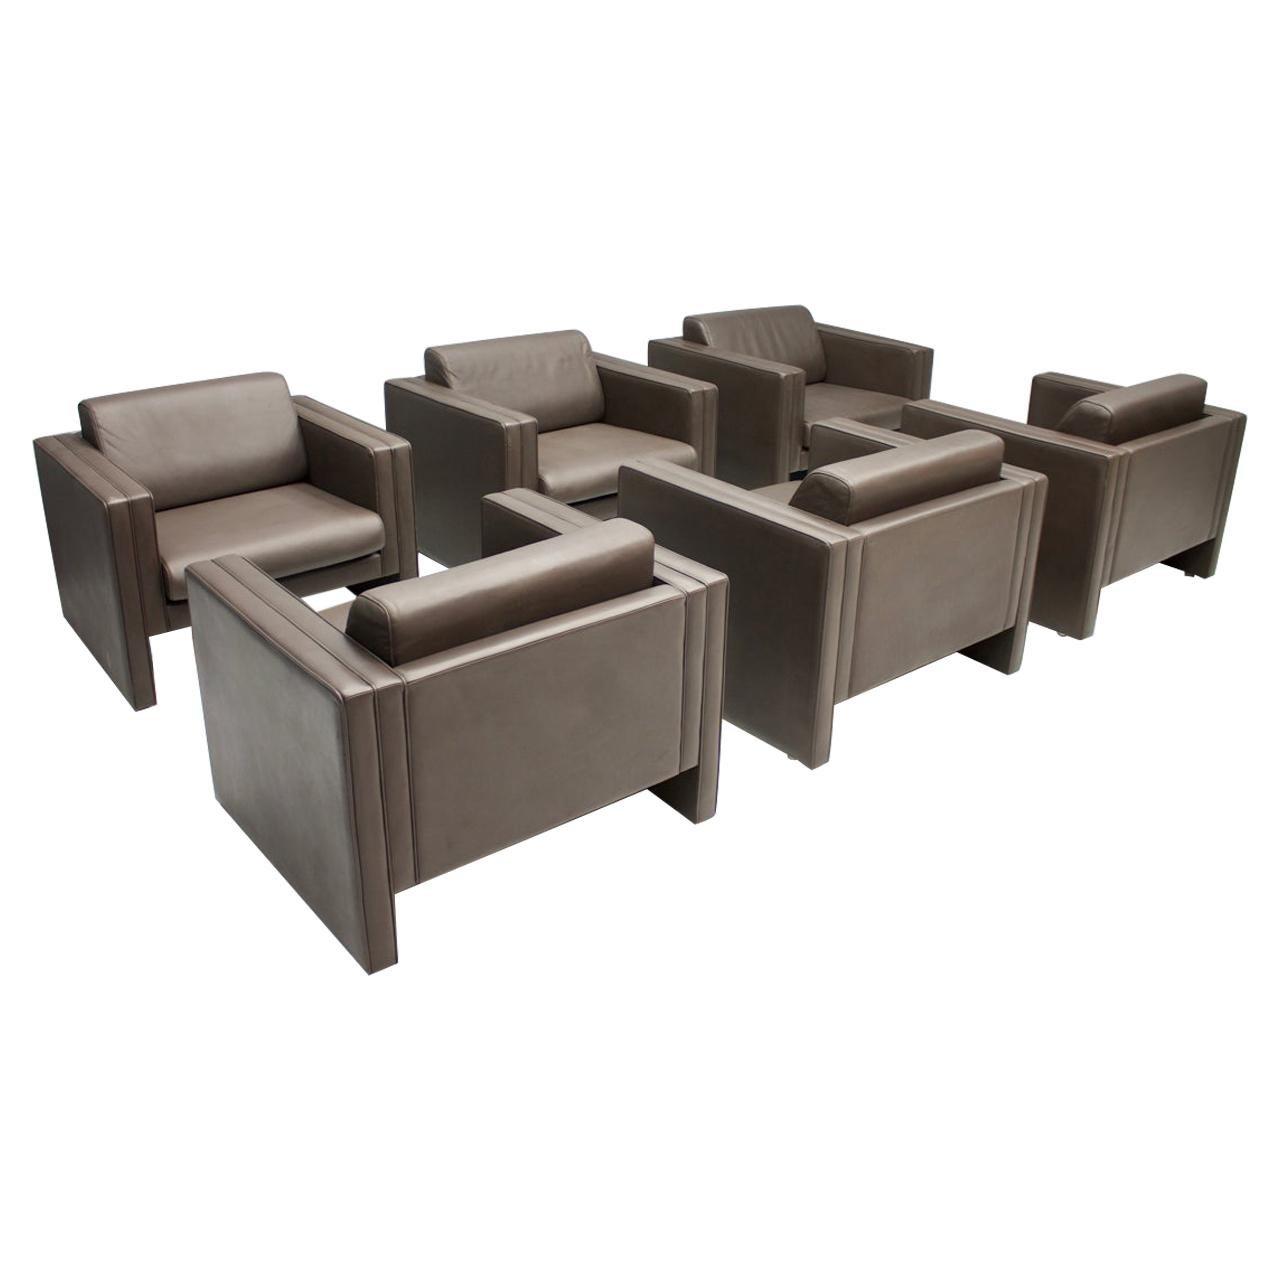 "Walter Knoll ""Studio"" Dark Brown Leather Lounge Chairs, 1975"